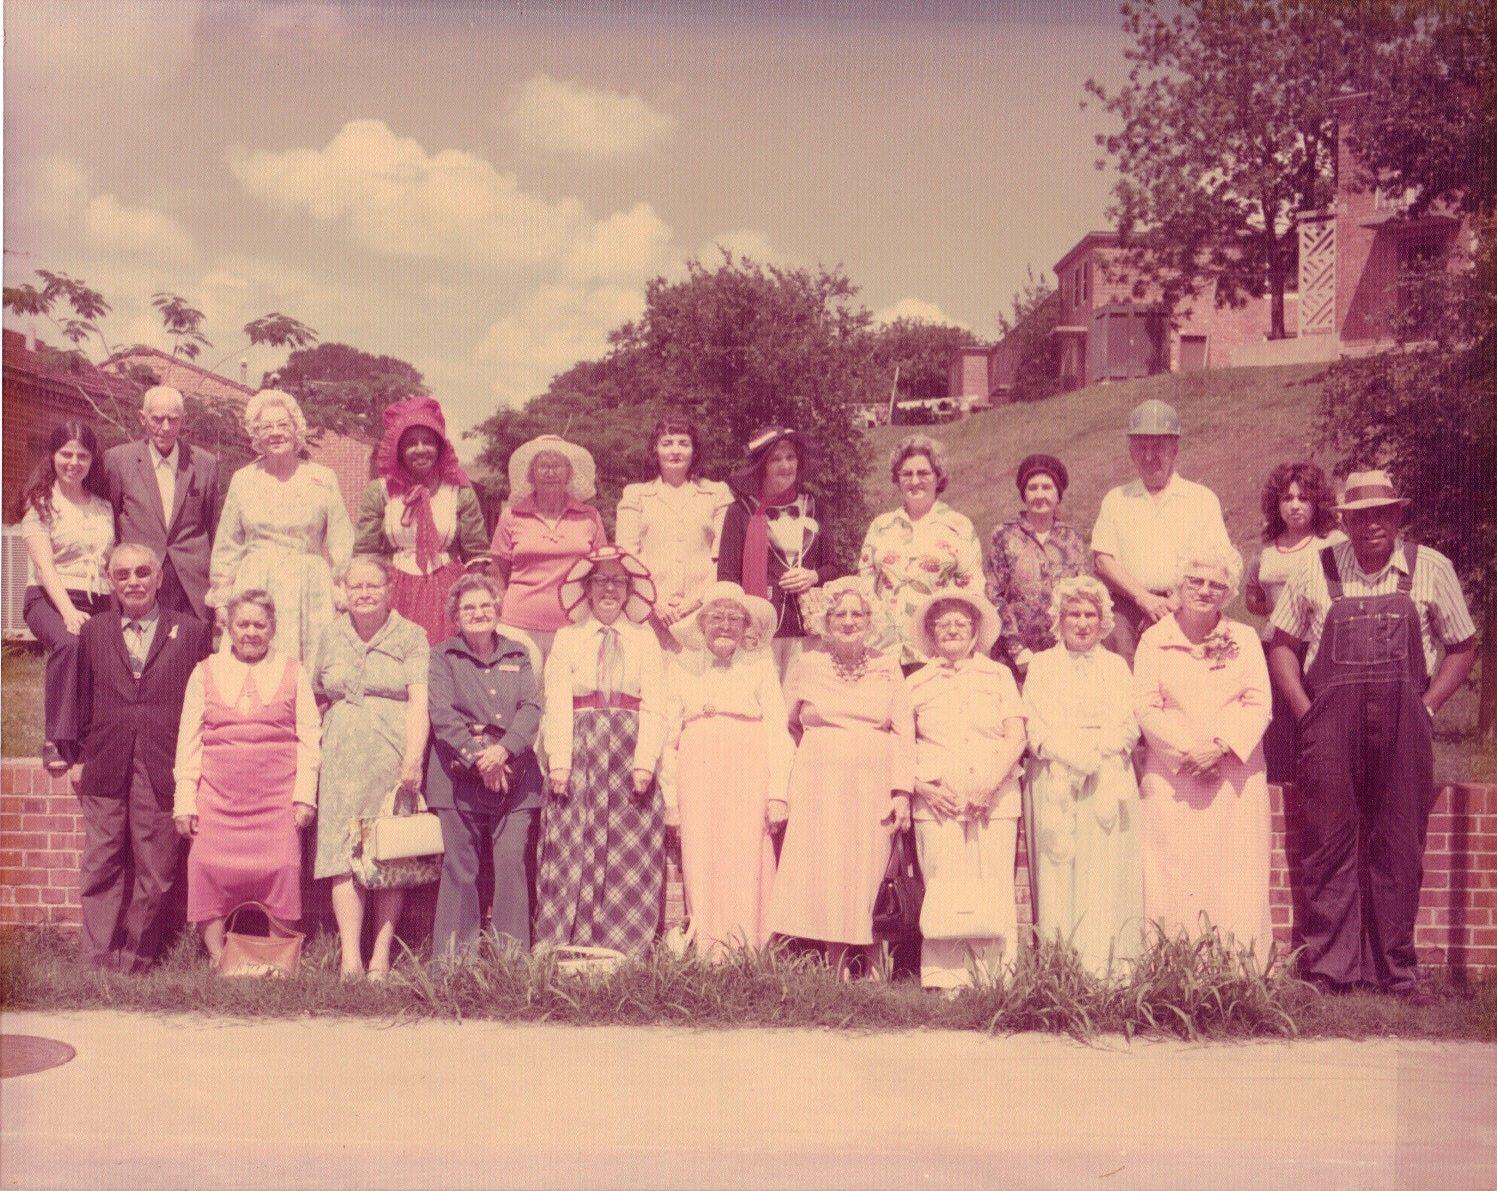 1960s photo of seniors dressed up as pioneers